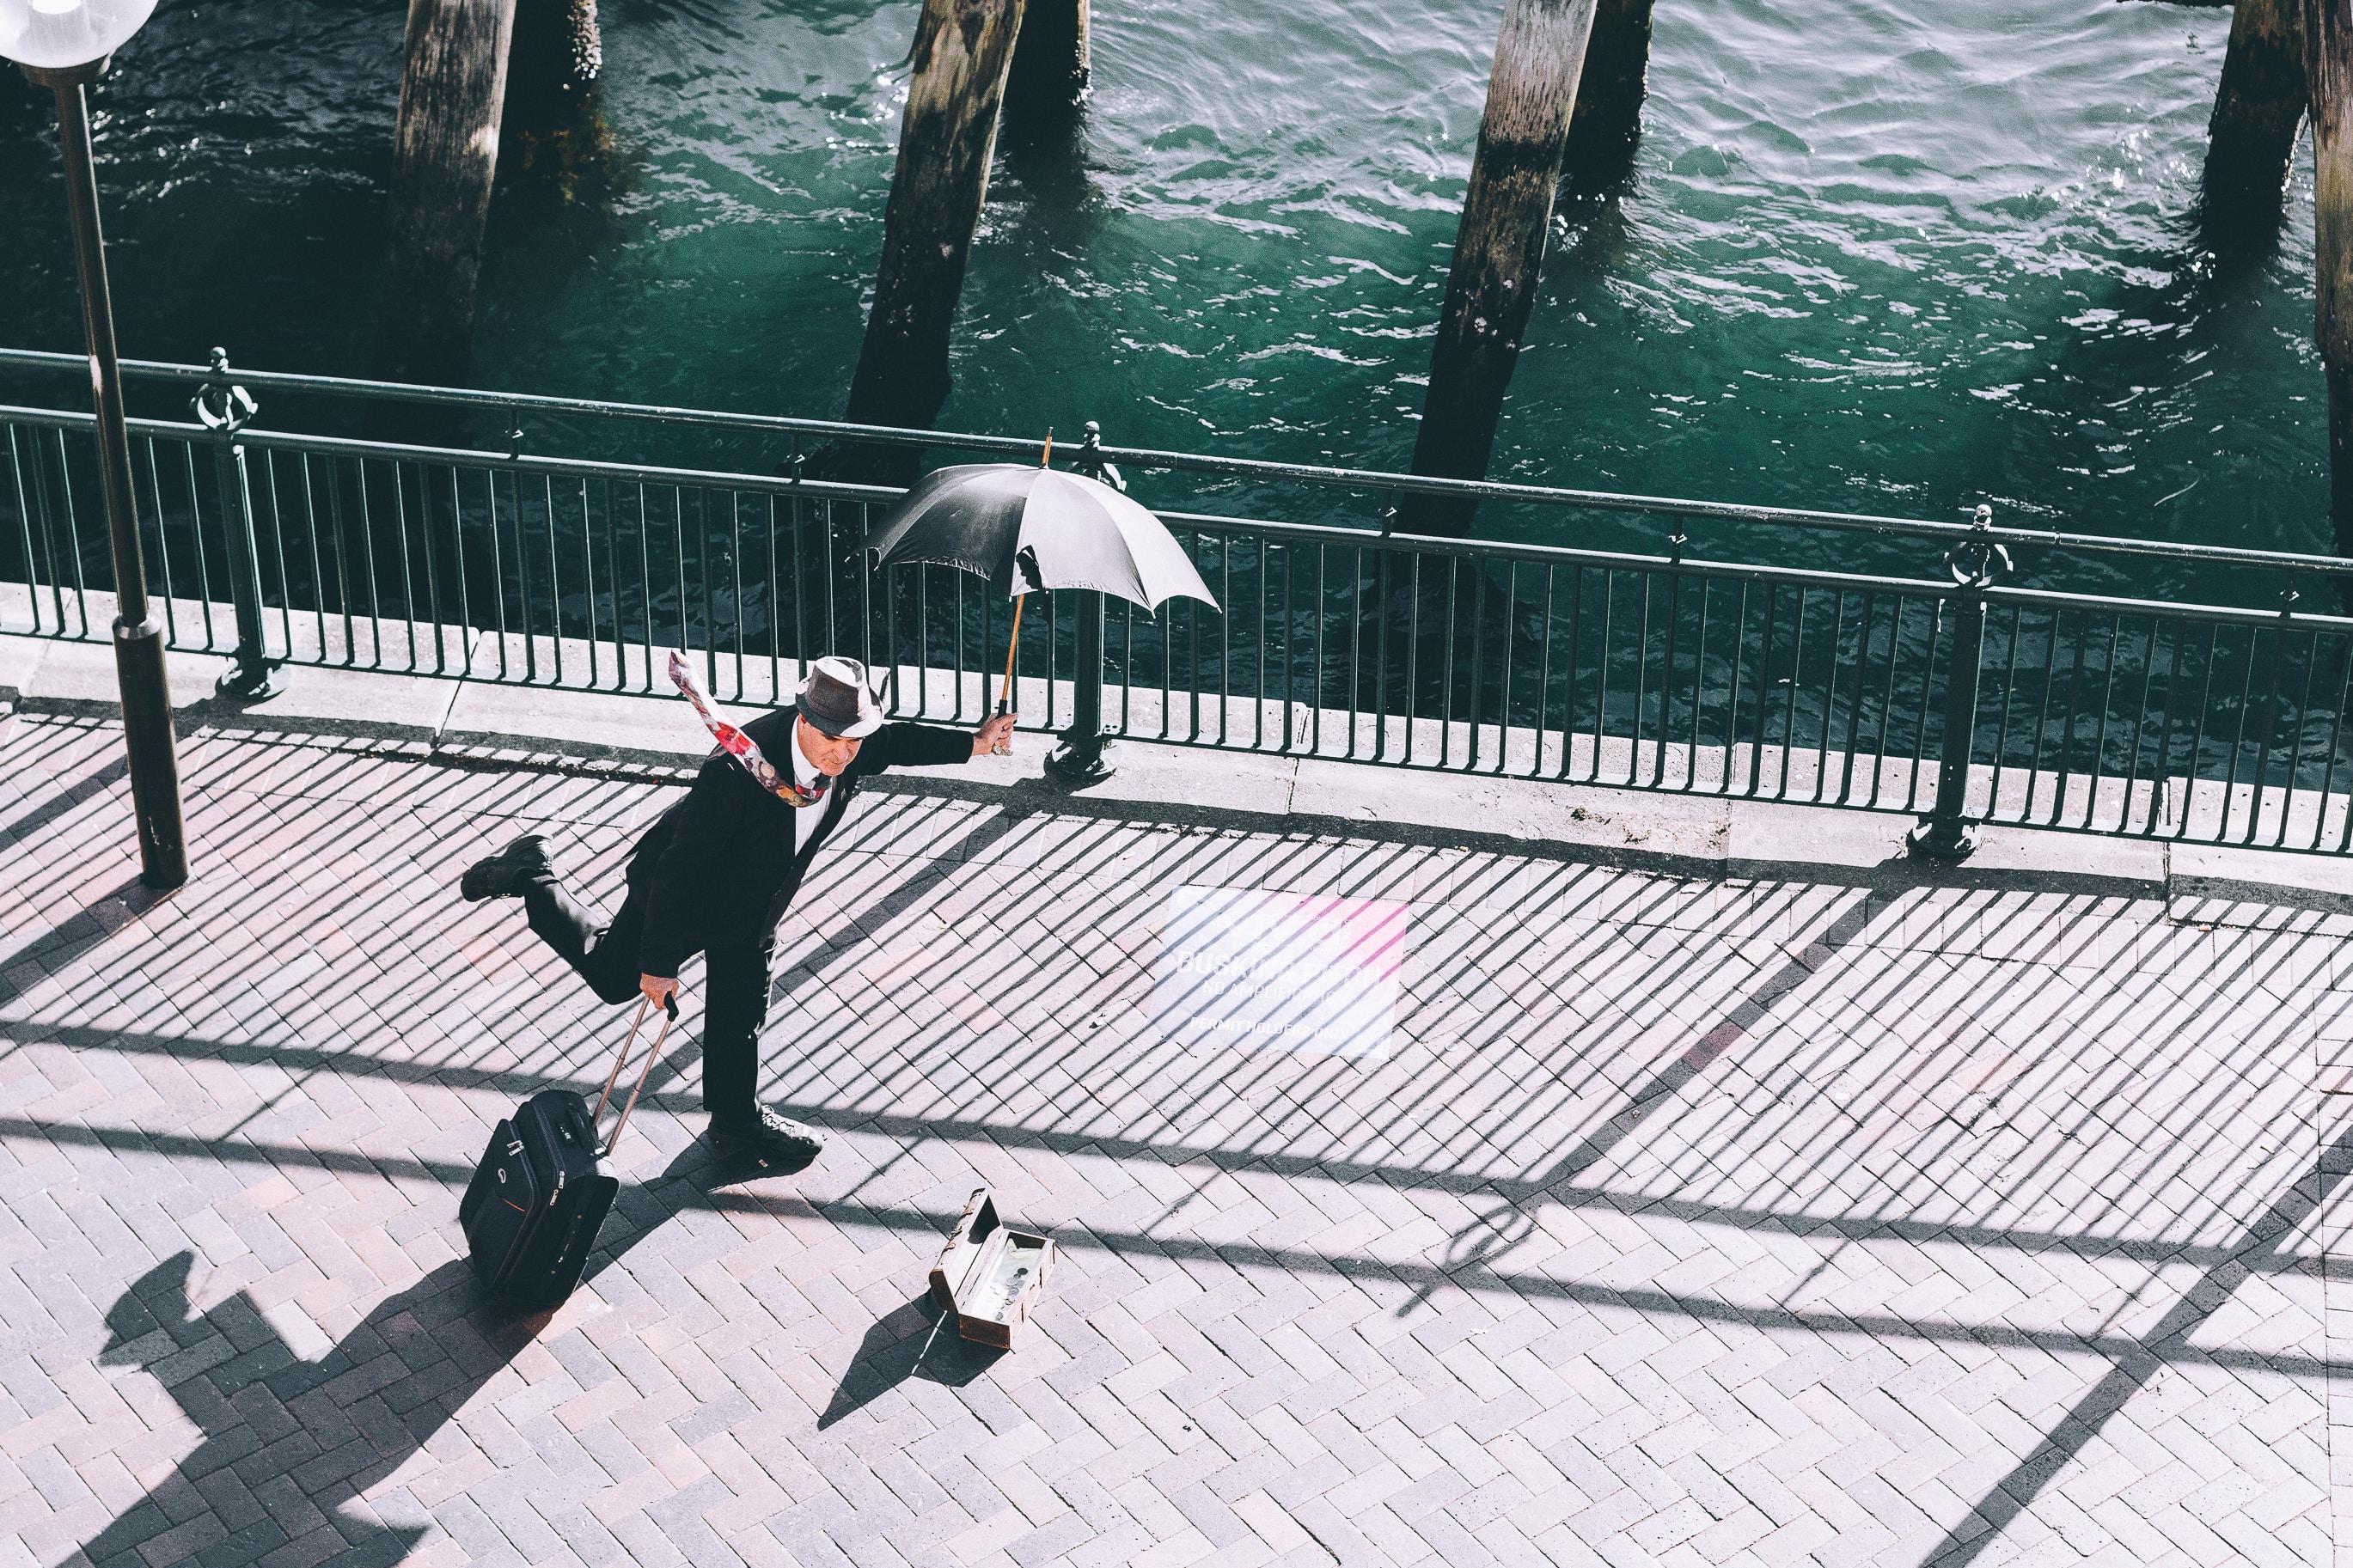 man holding umbrella and trolley bag on bridge